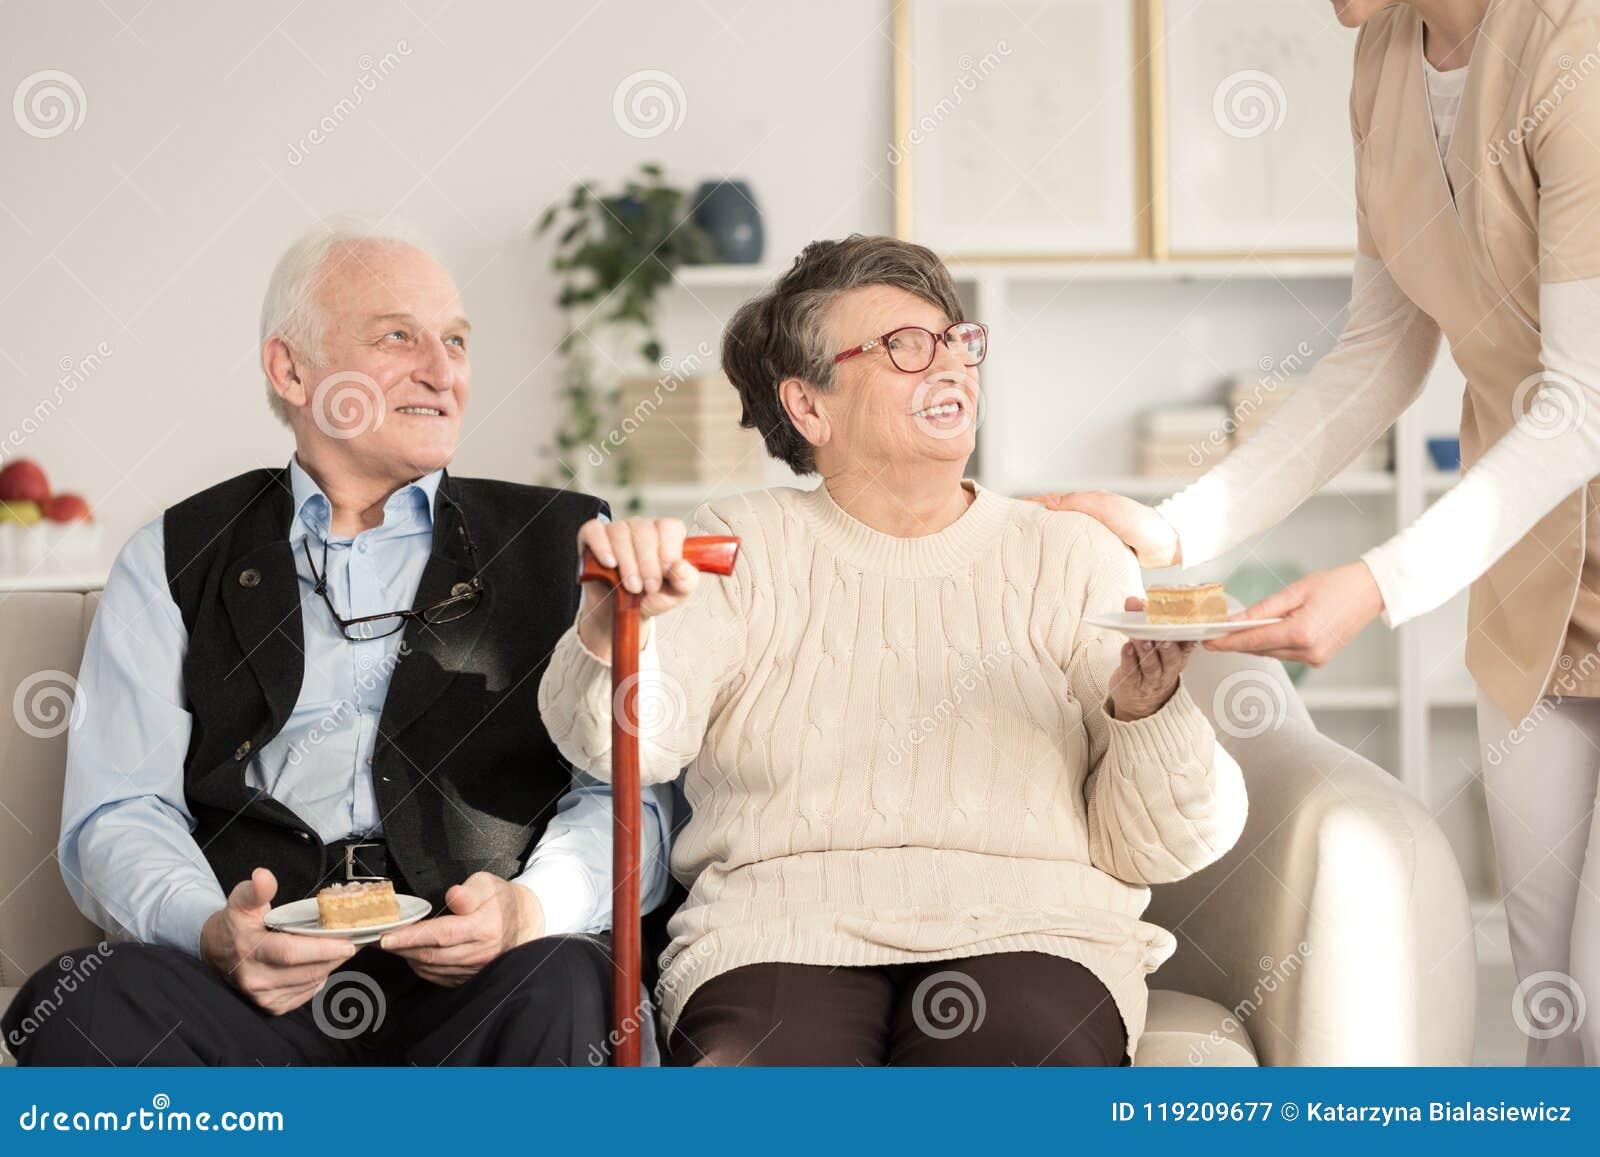 Caregiver serving cake